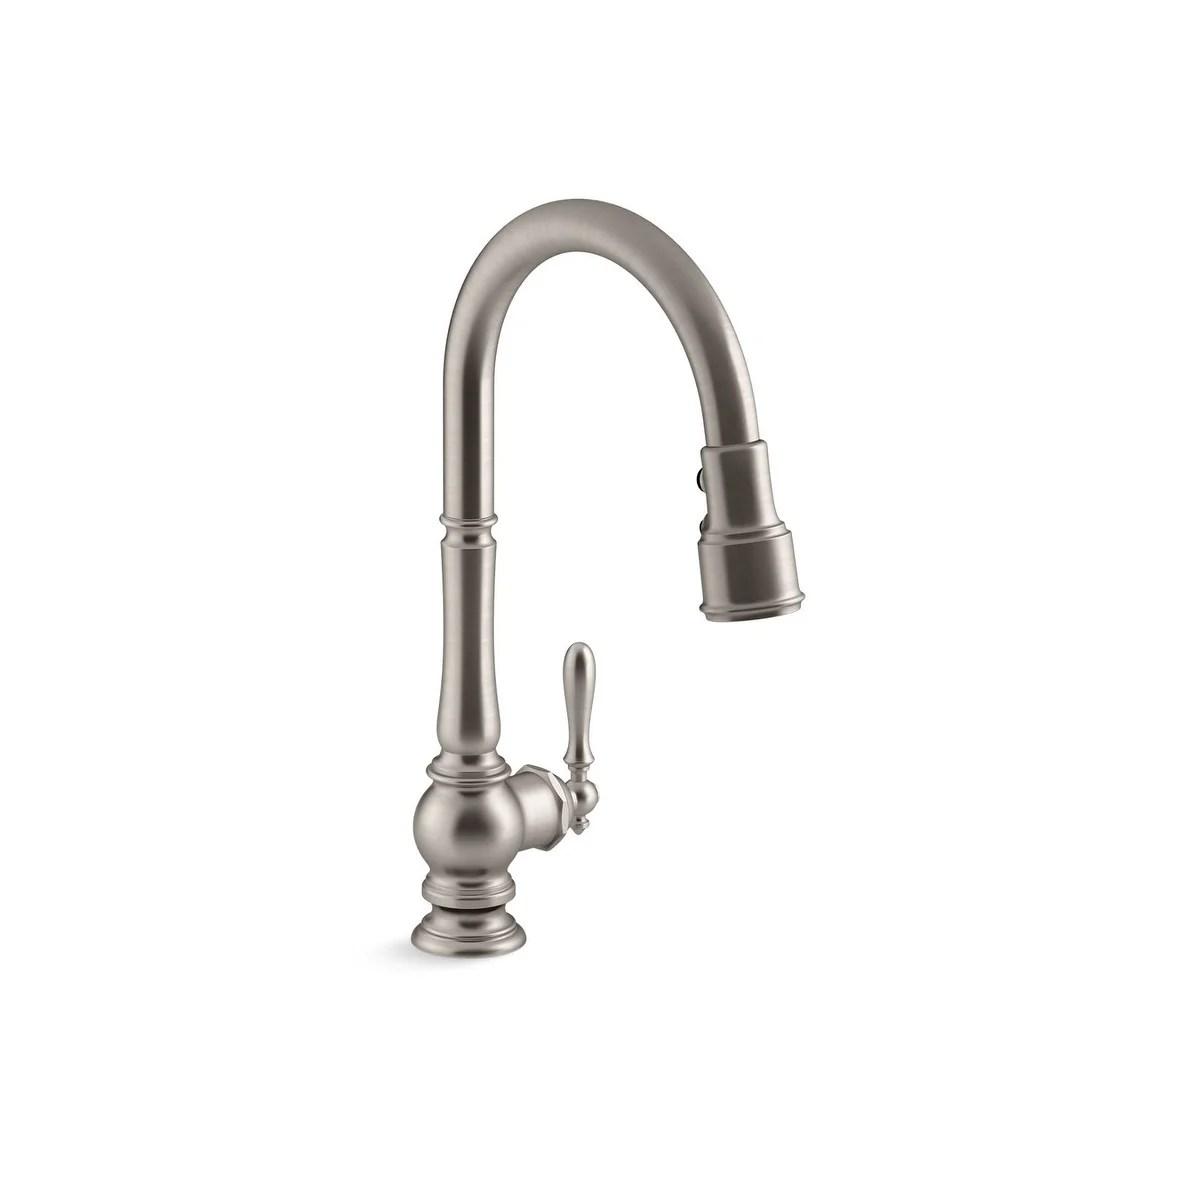 kohler artifacts pullout spray single hole kitchen faucet k 99259 2bz oil rubbed bronze